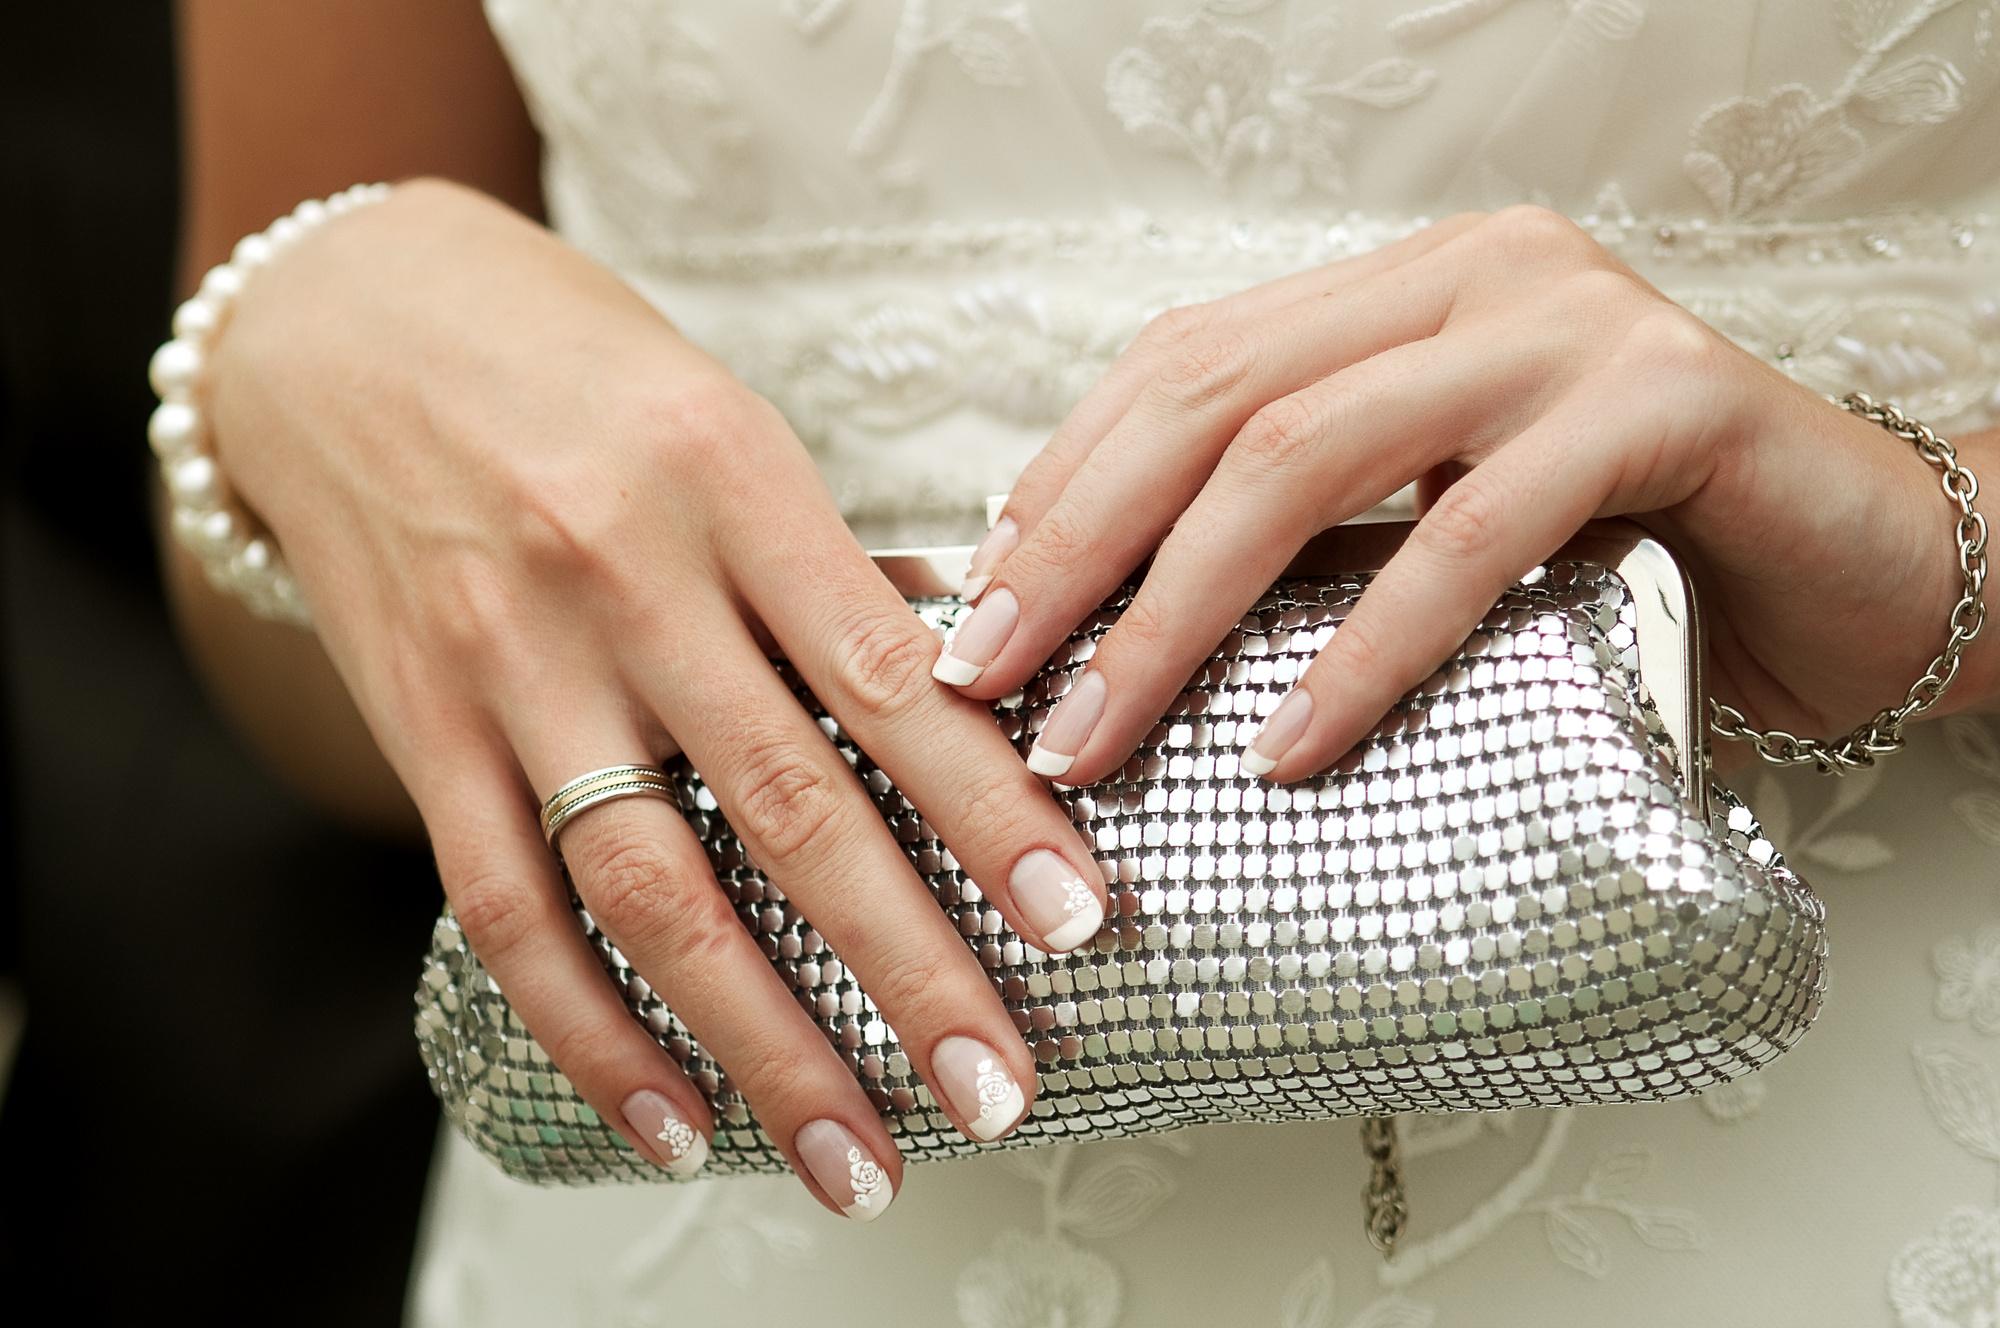 ost expensive luxury handbag